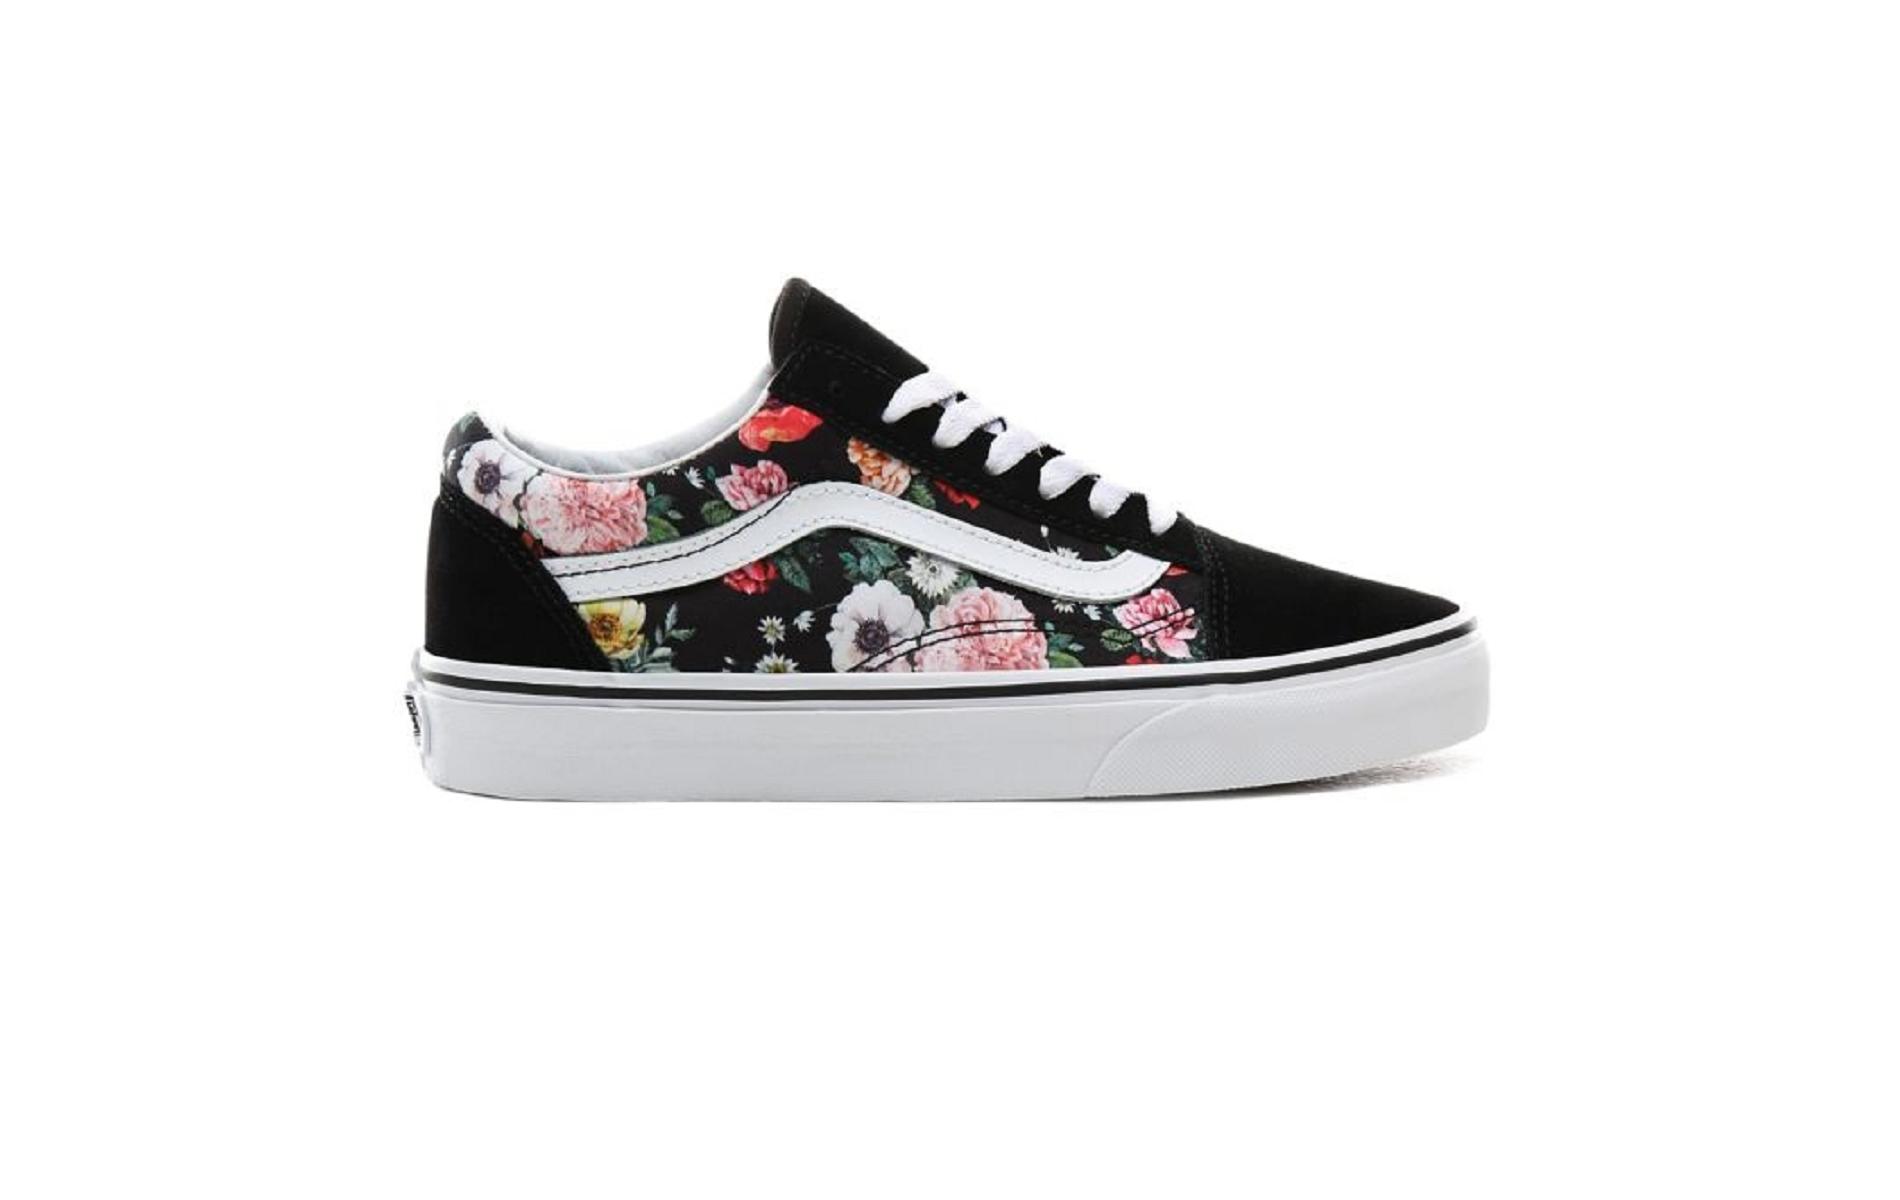 baskets vans femme fleurs